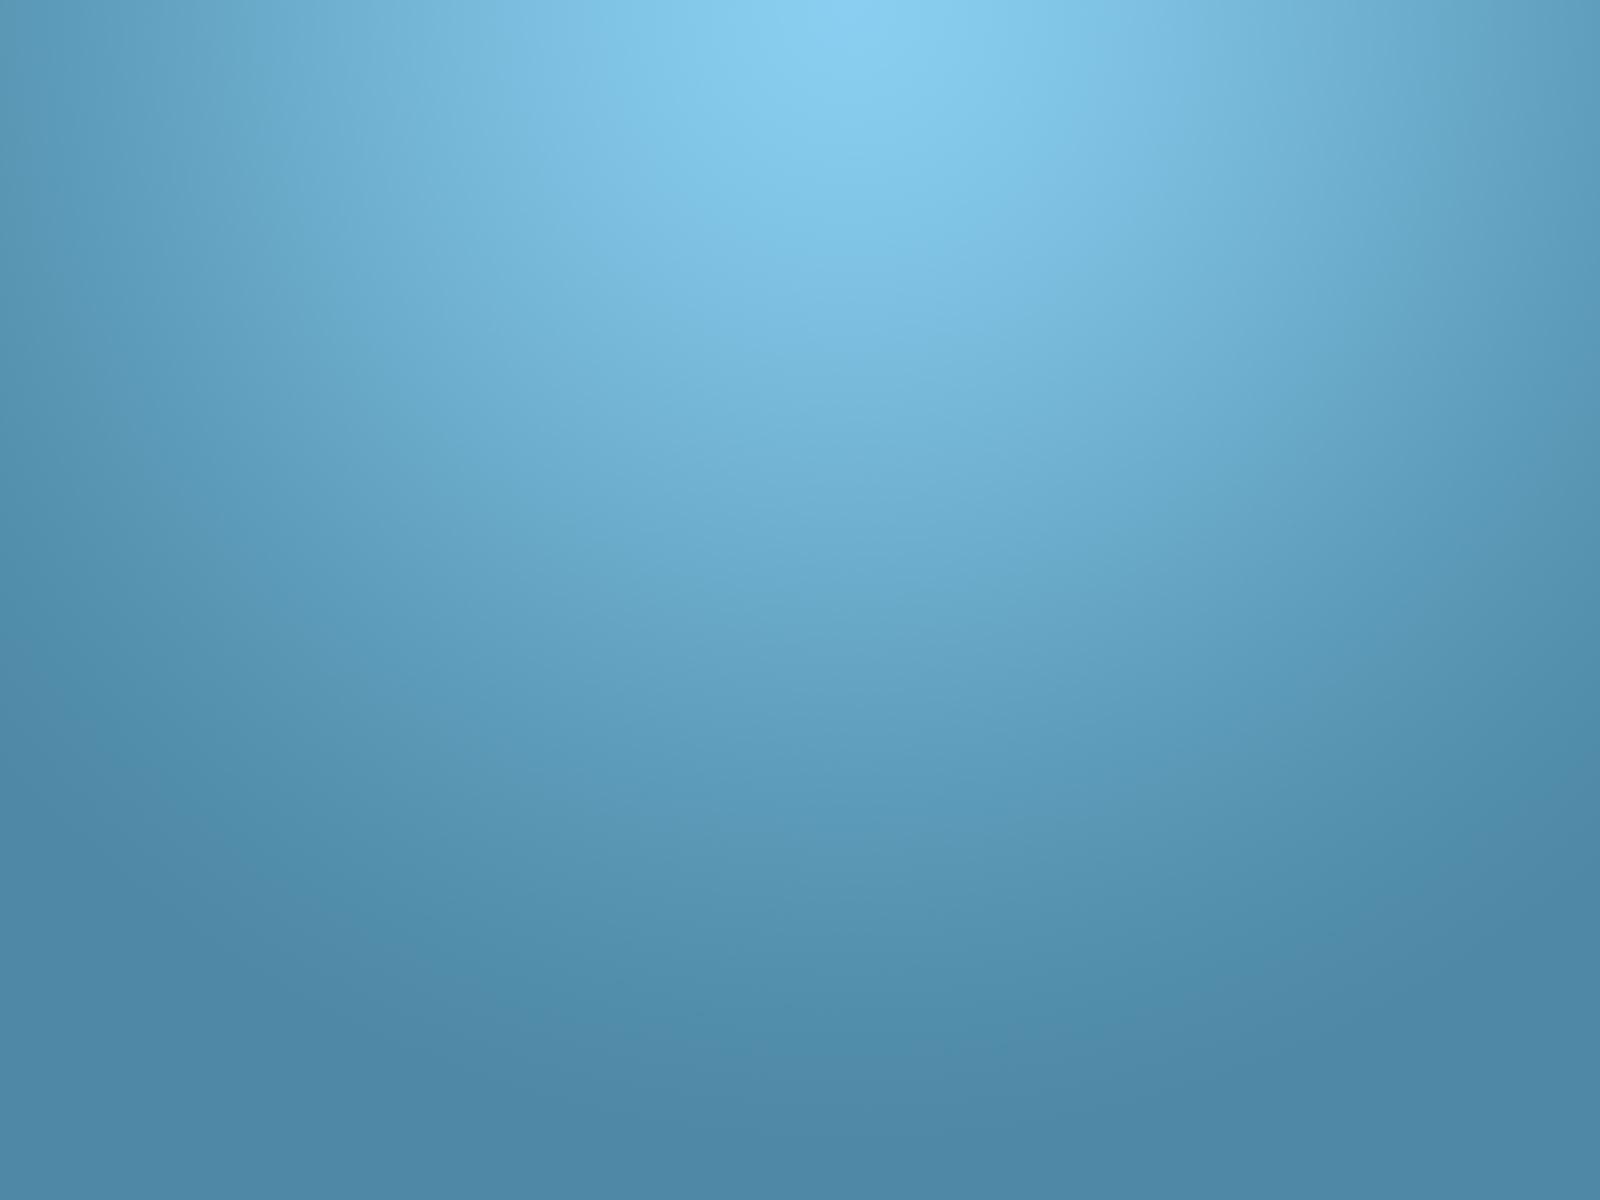 Pin Baby Blue Windows 7 Desktop Wallpaper Wallpapers 1600x1200